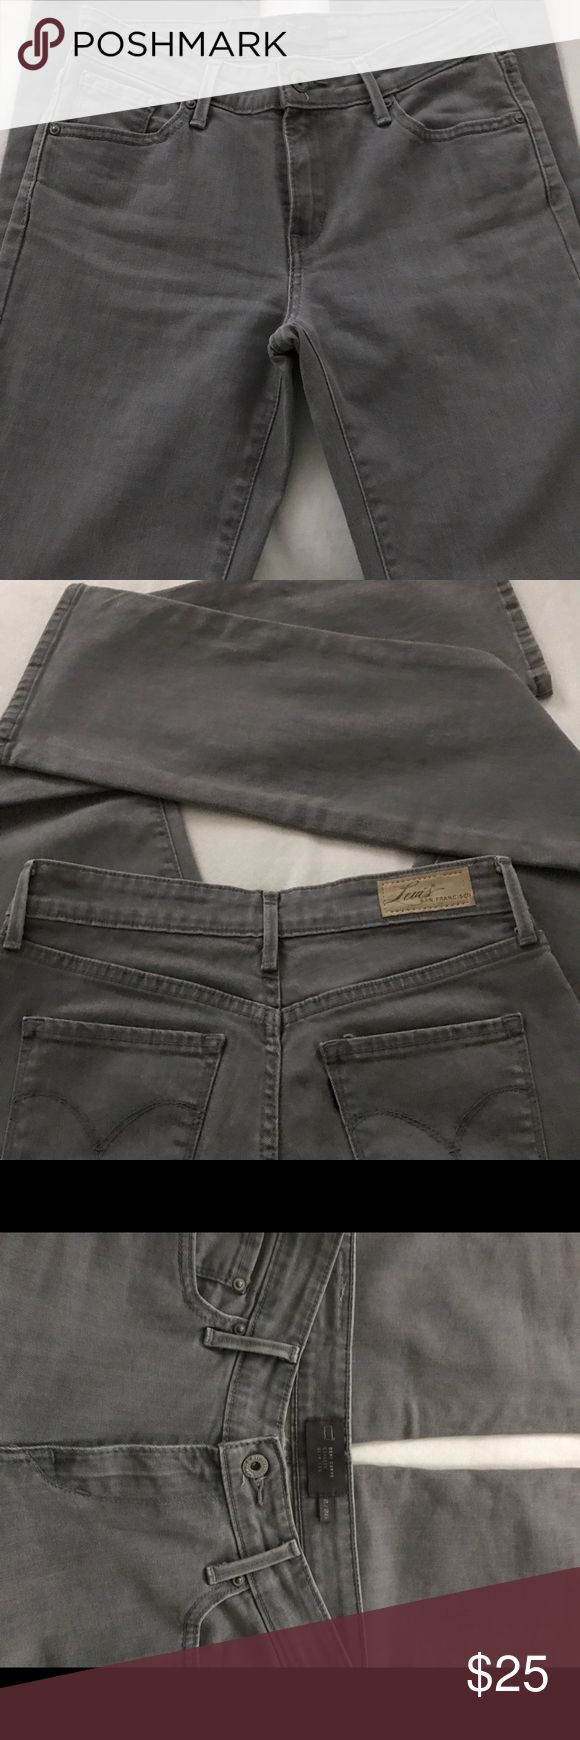 "Levi's ladies jeans Gray Levi's ladies jean Demi curve slim leg 31"" inseam Levi's Jeans Straight Leg"